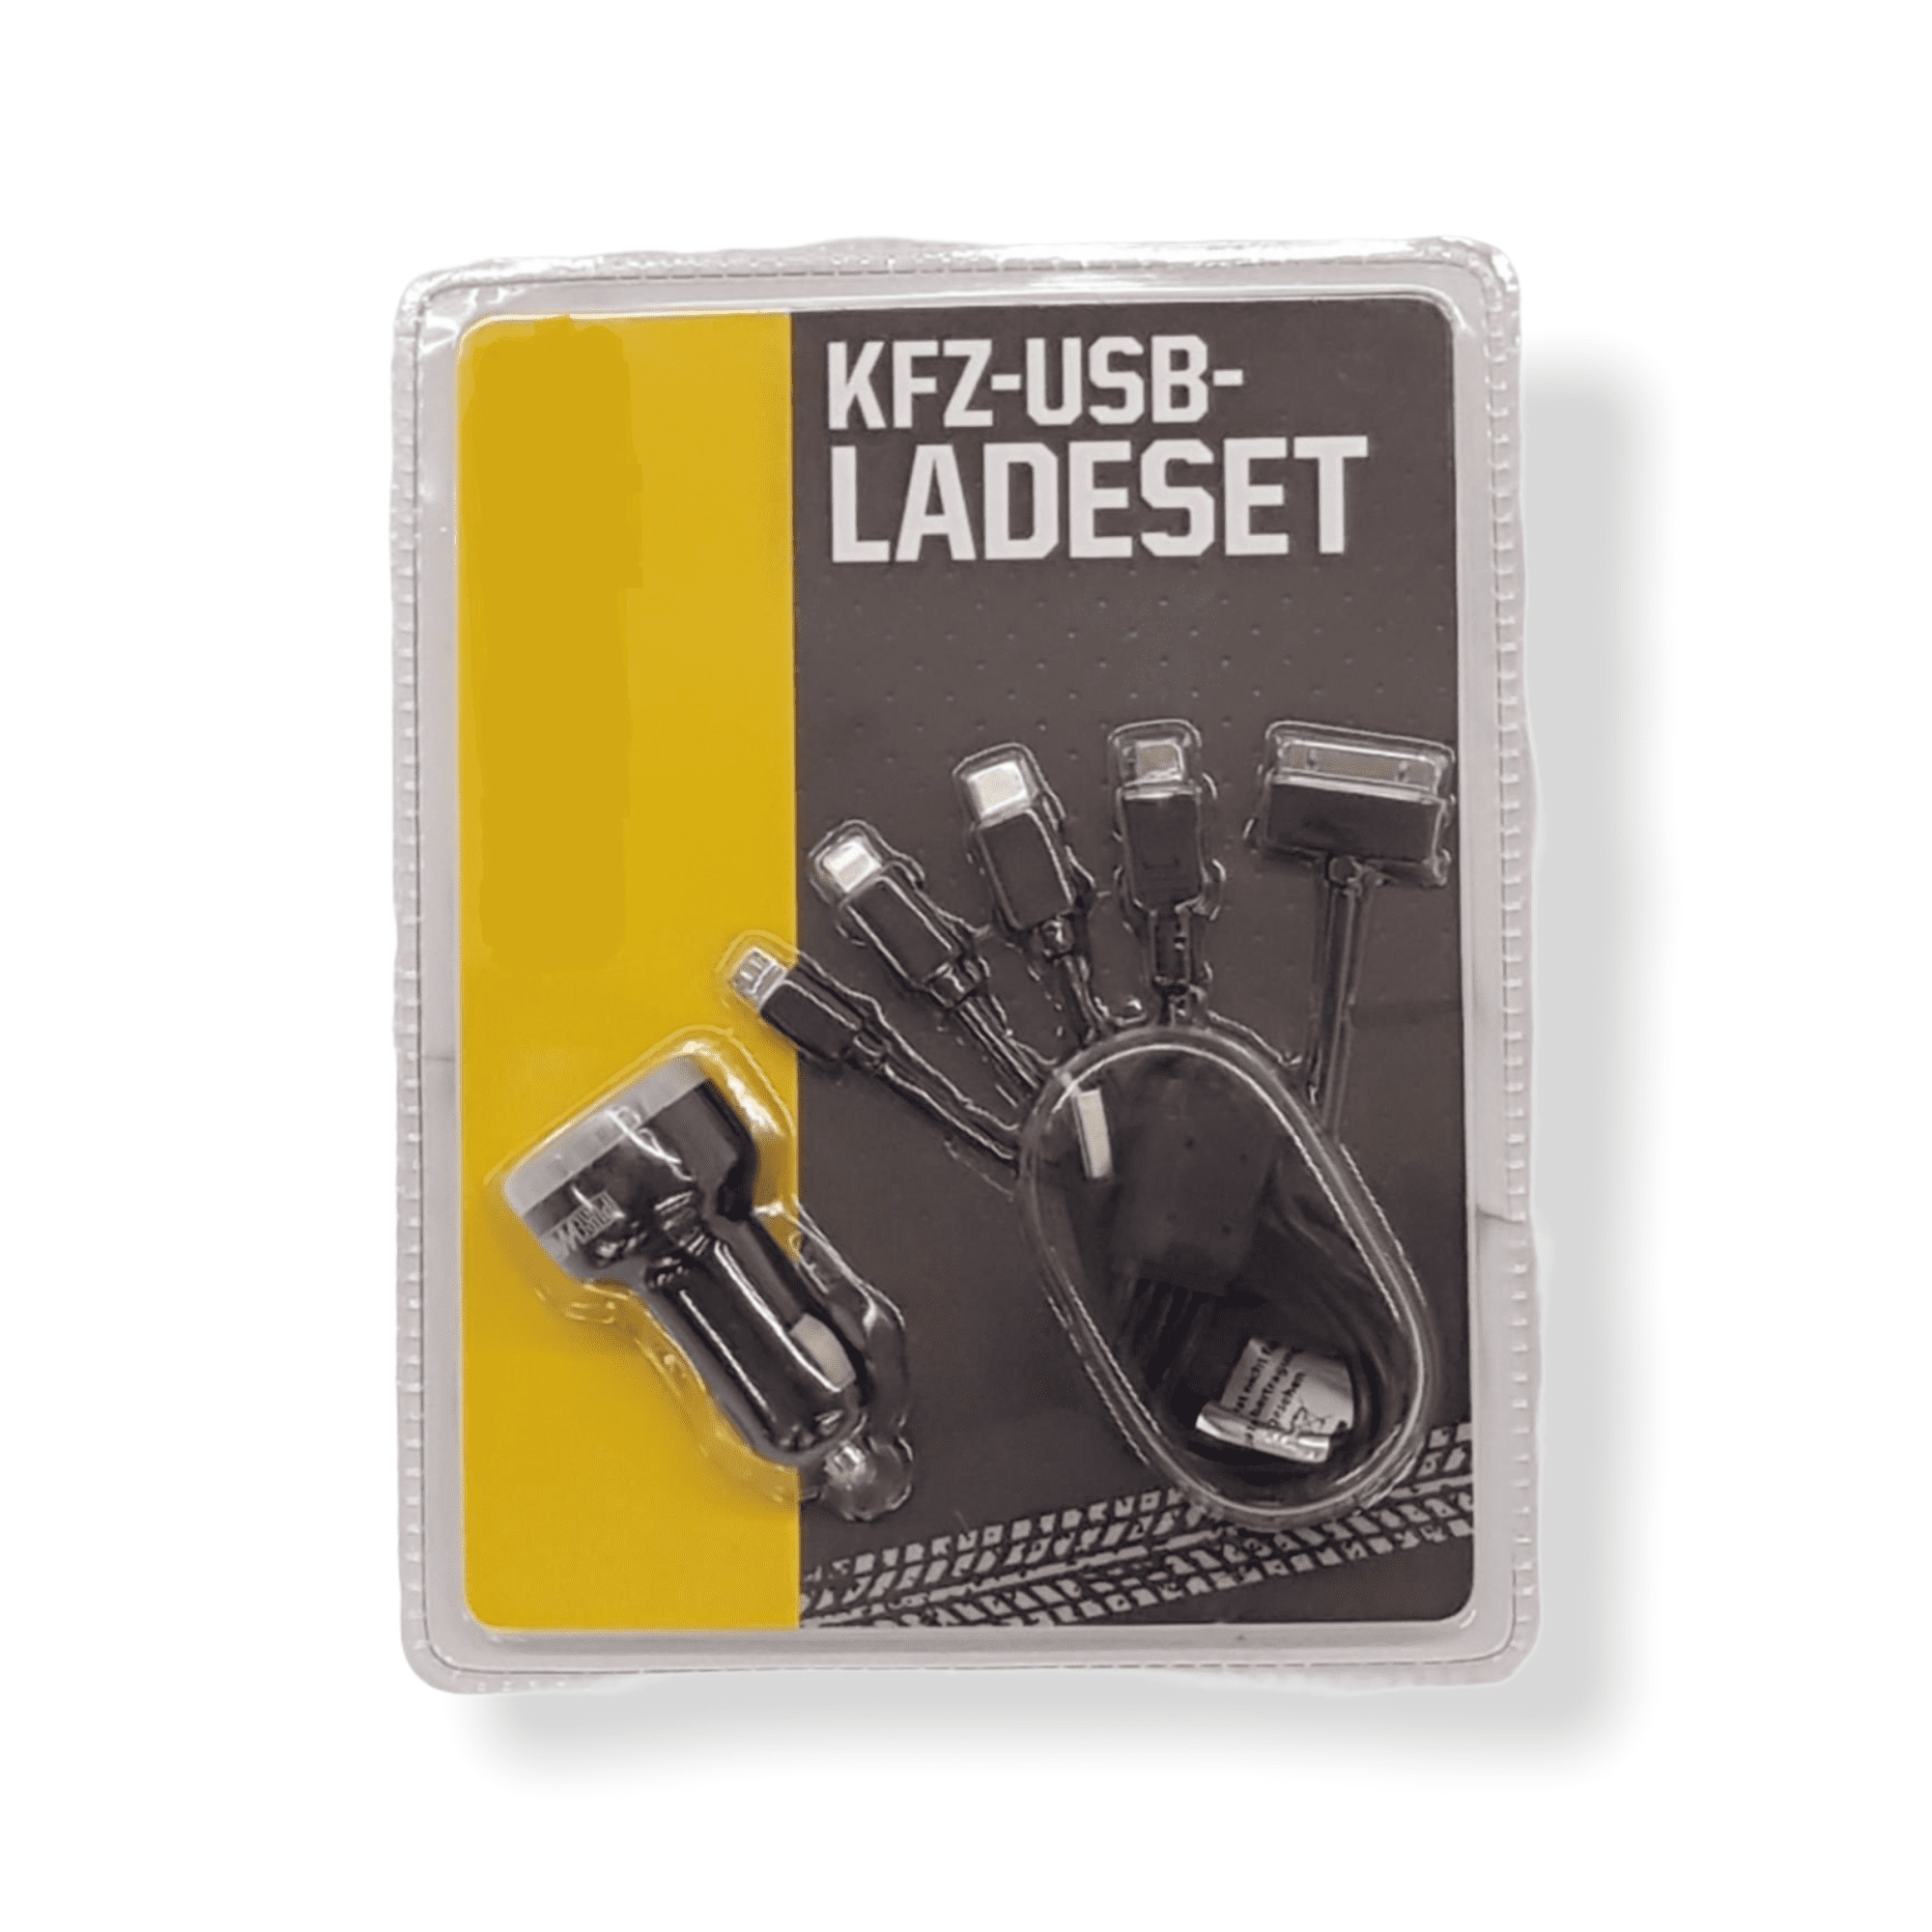 KFZ-USB-Ladeset